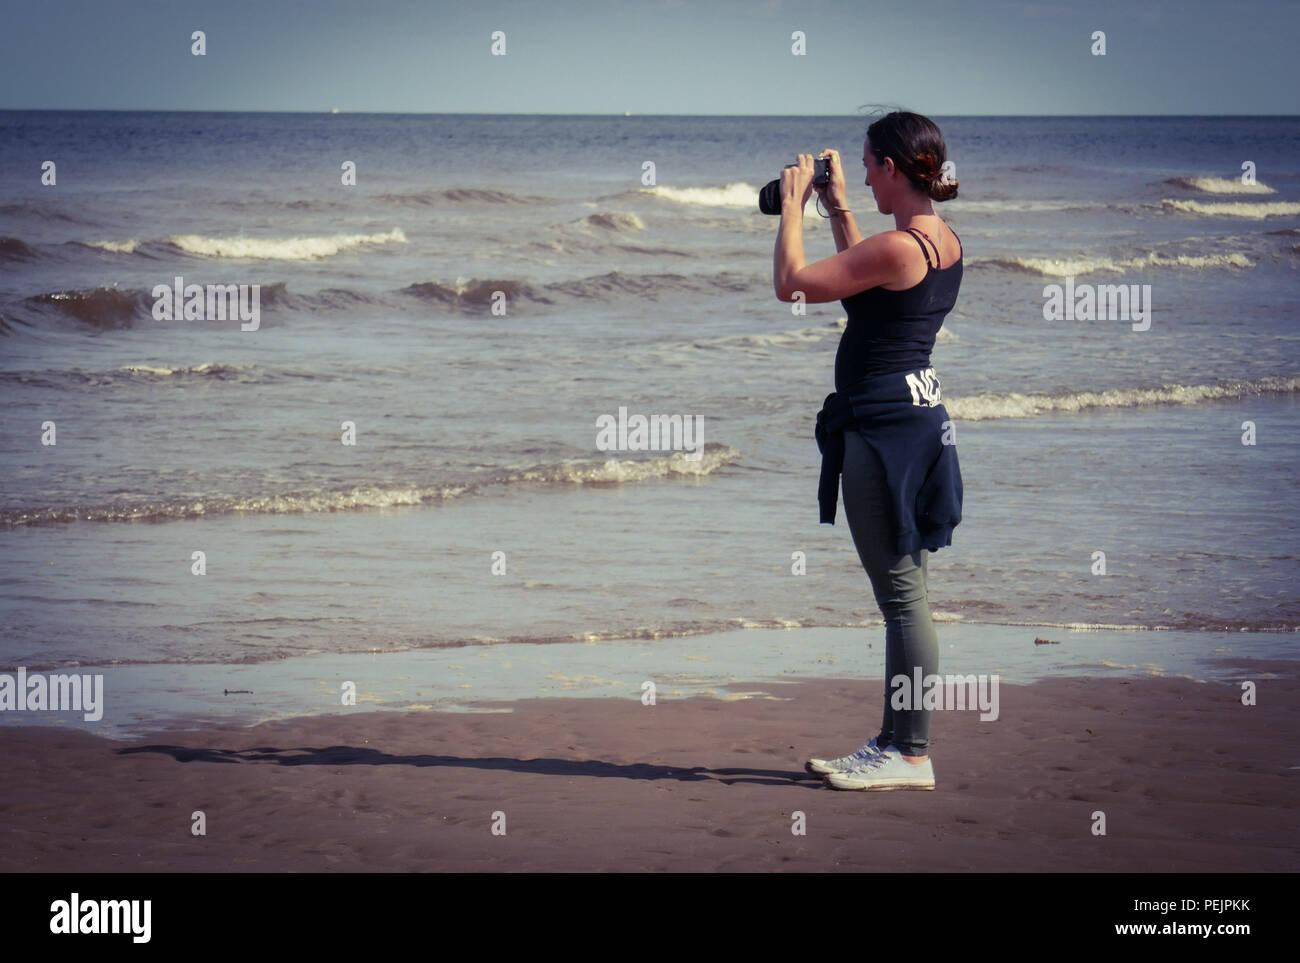 Girl on the beach - Stock Image